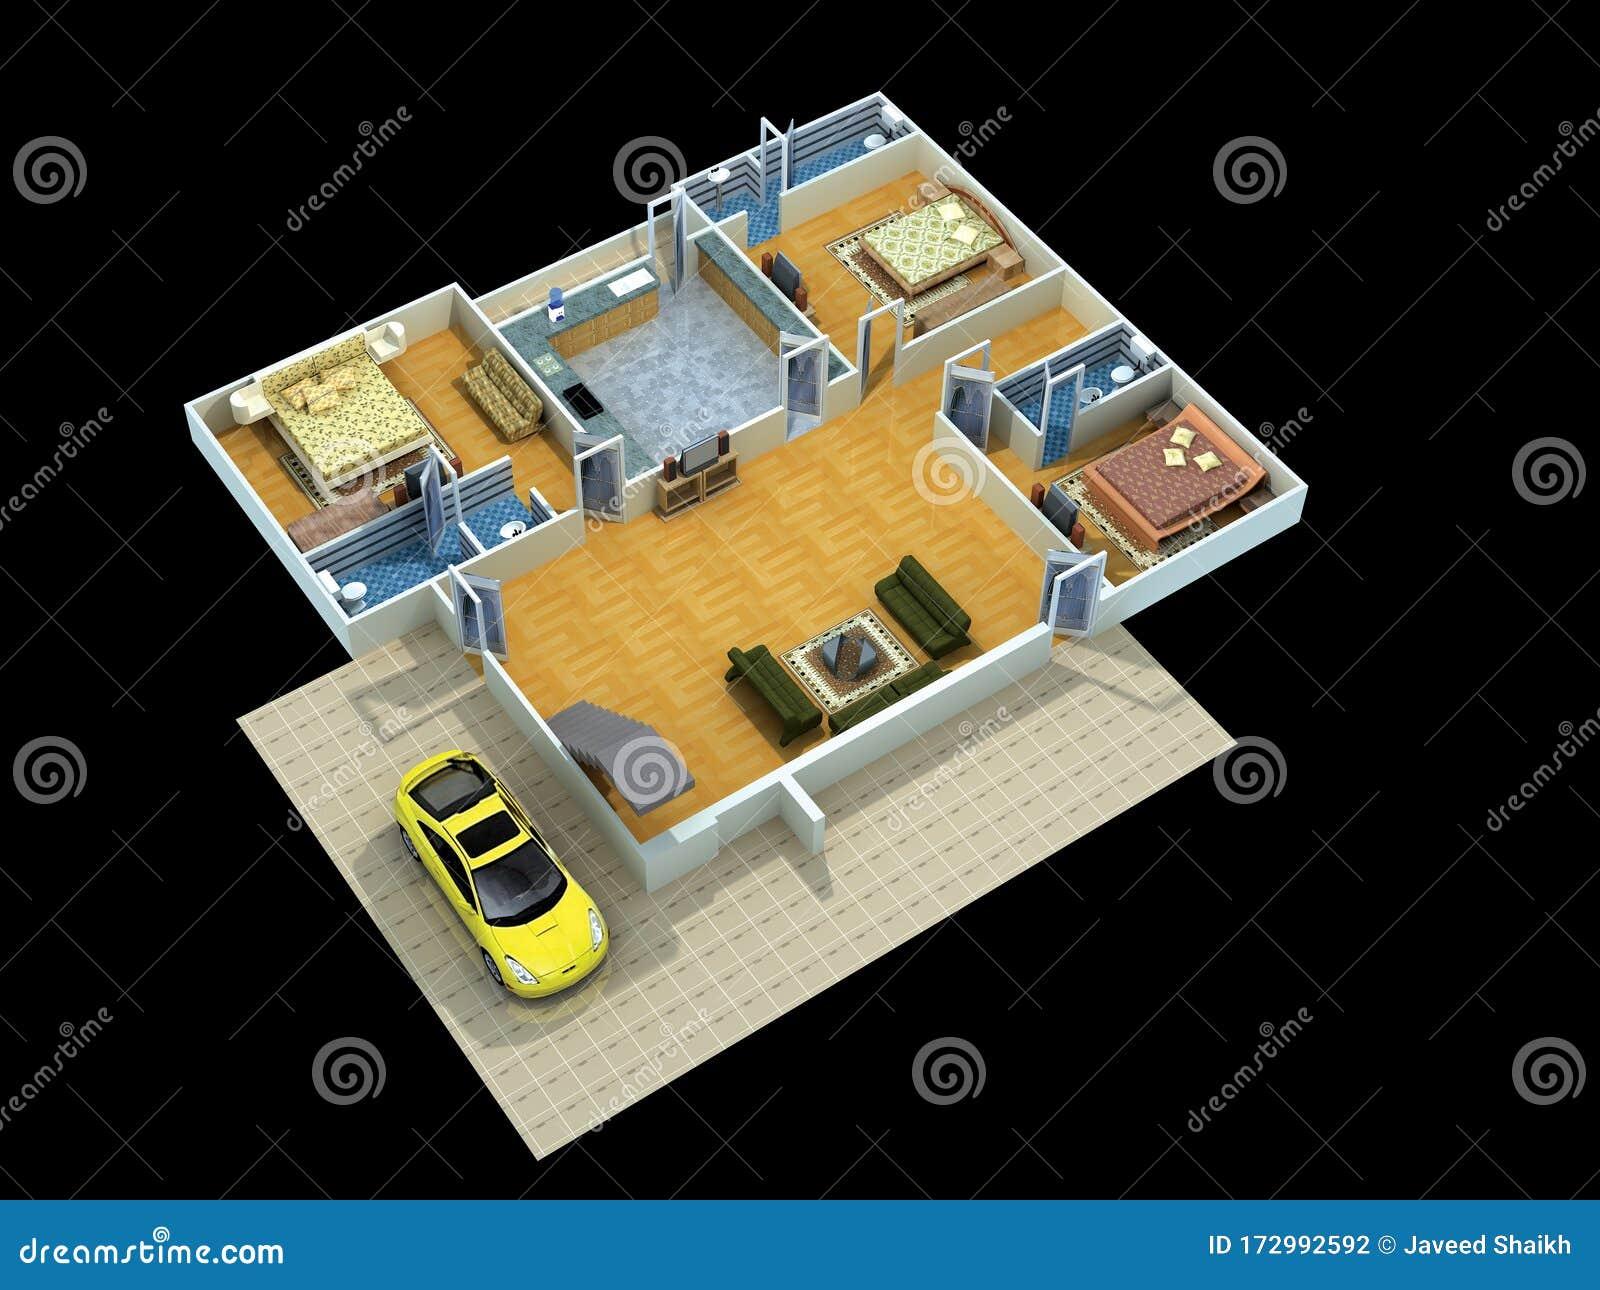 Interior Design Ideas & Home Decorating Stock Illustration ...